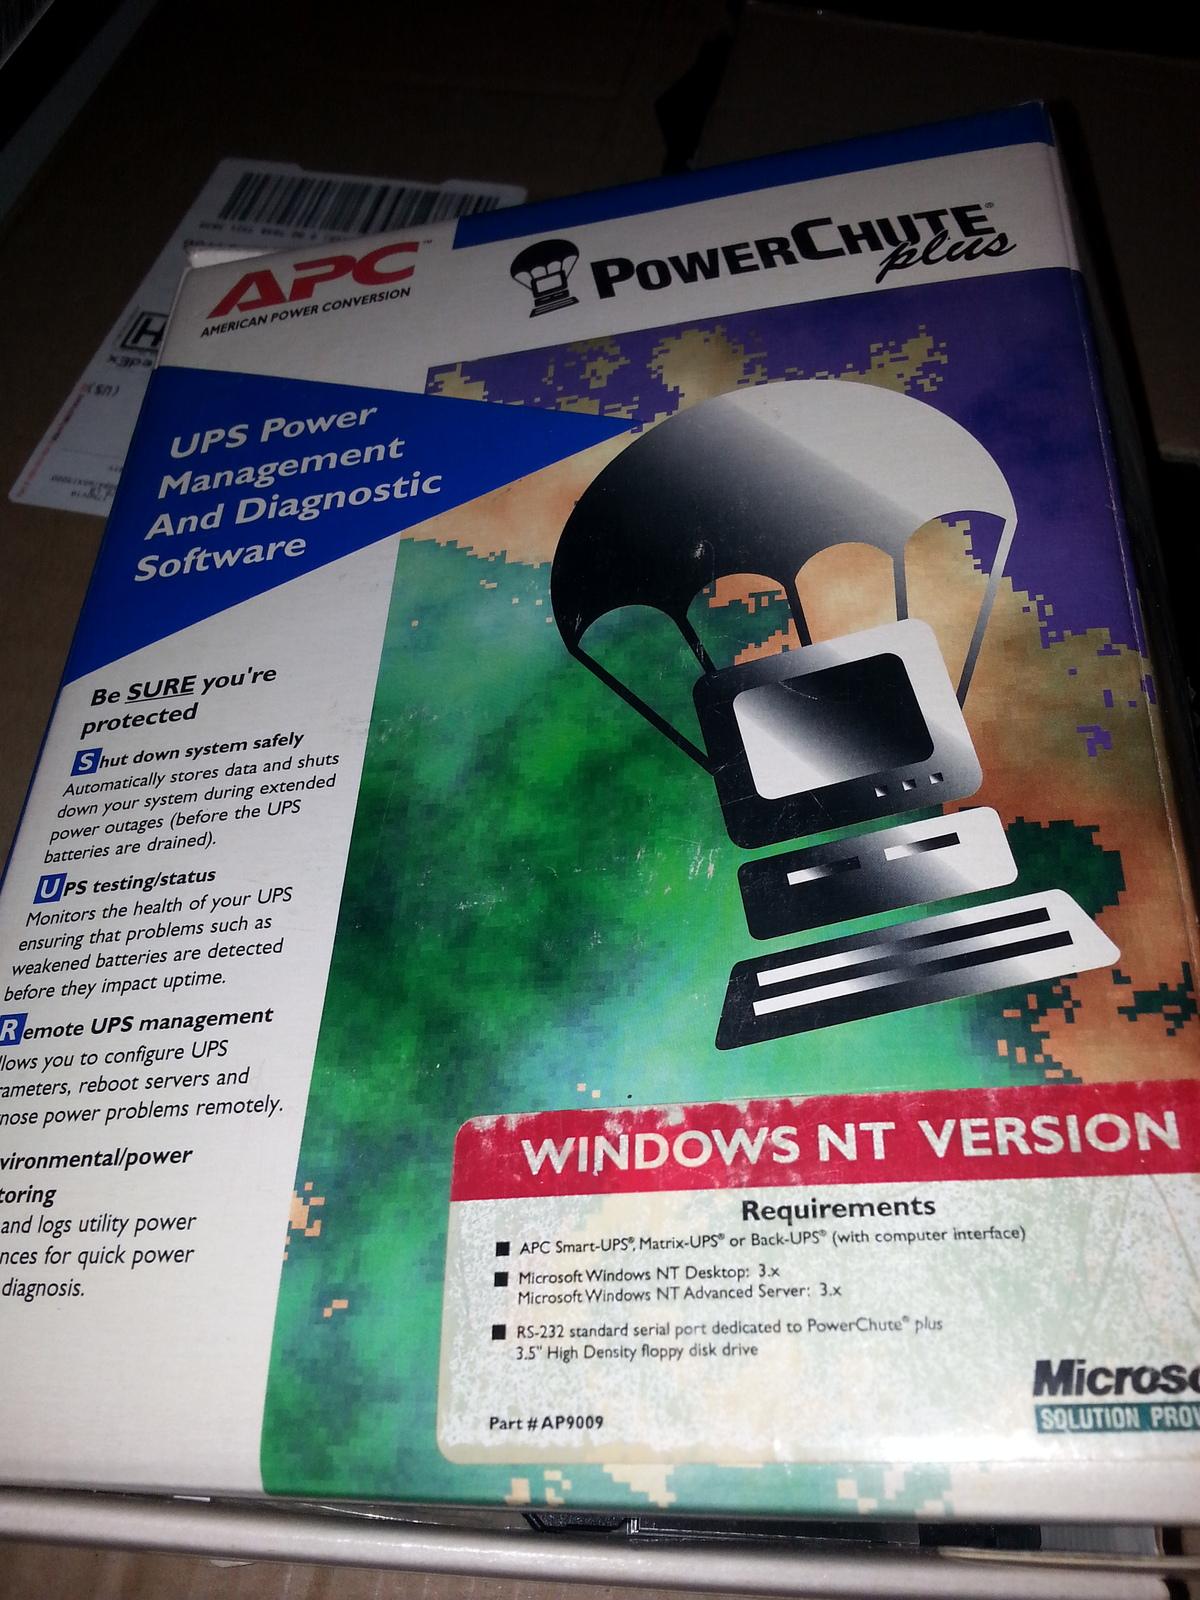 APC Powerchute Plus Windows NT 3x - $25.00